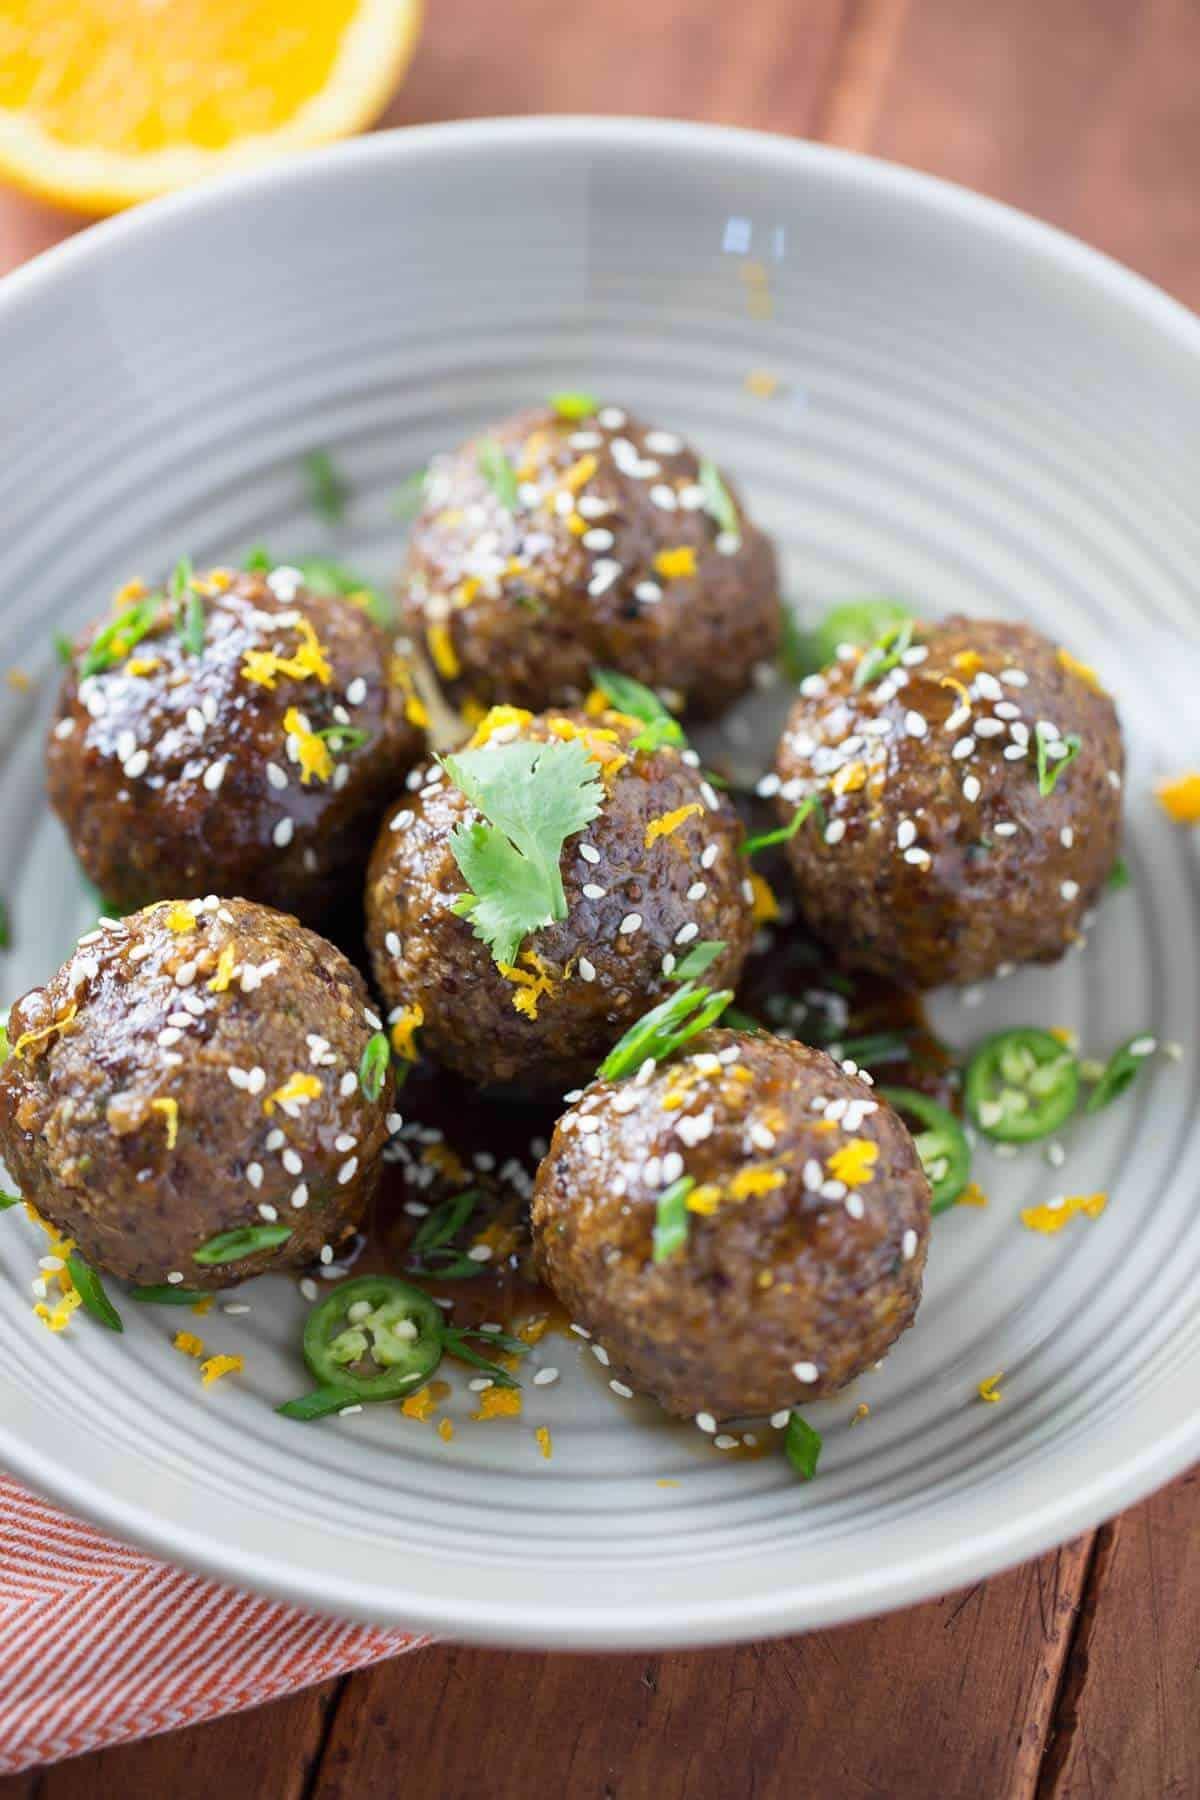 Savory Asian Spiced Quinoa Meatballs with Orange Sauce | jessicagavin.com #healthyrecipe